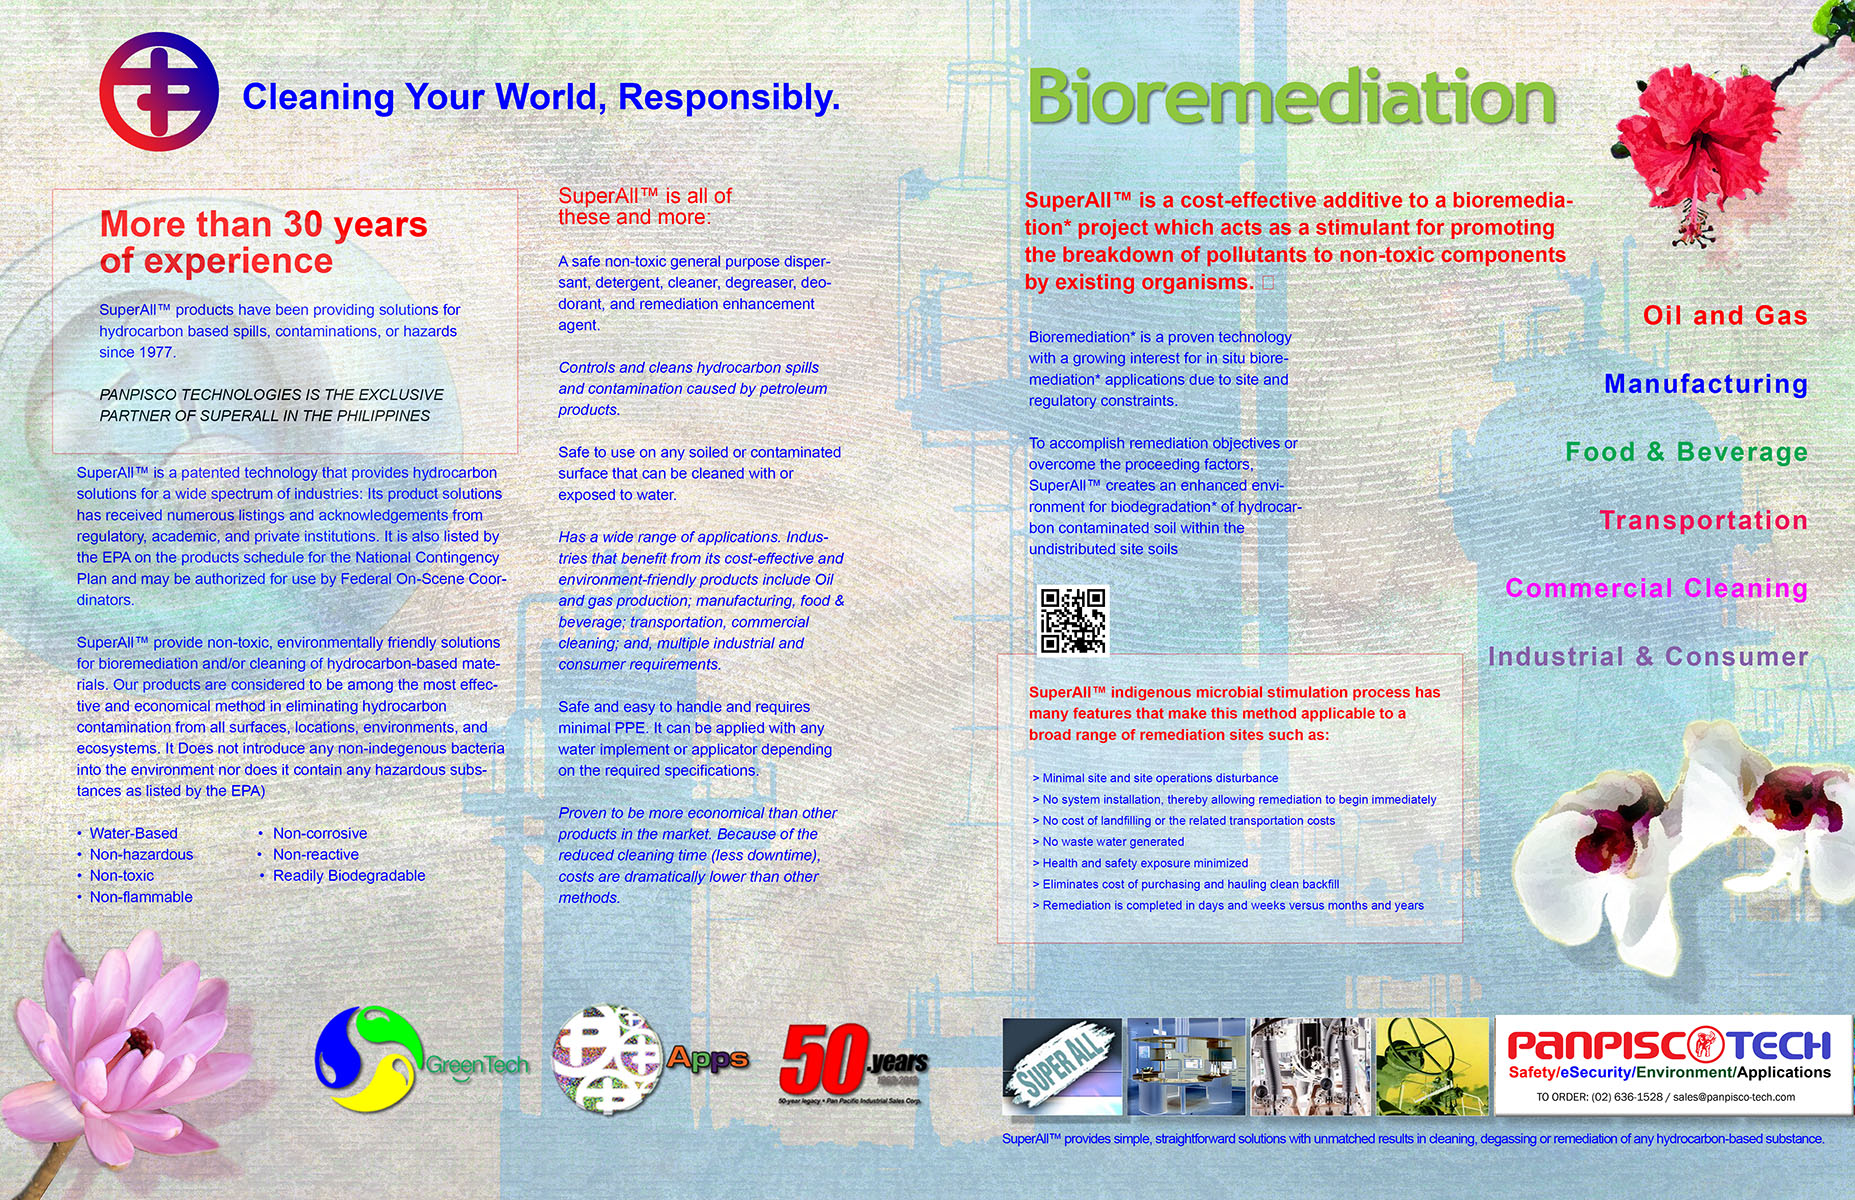 Superall Bioremediaiton